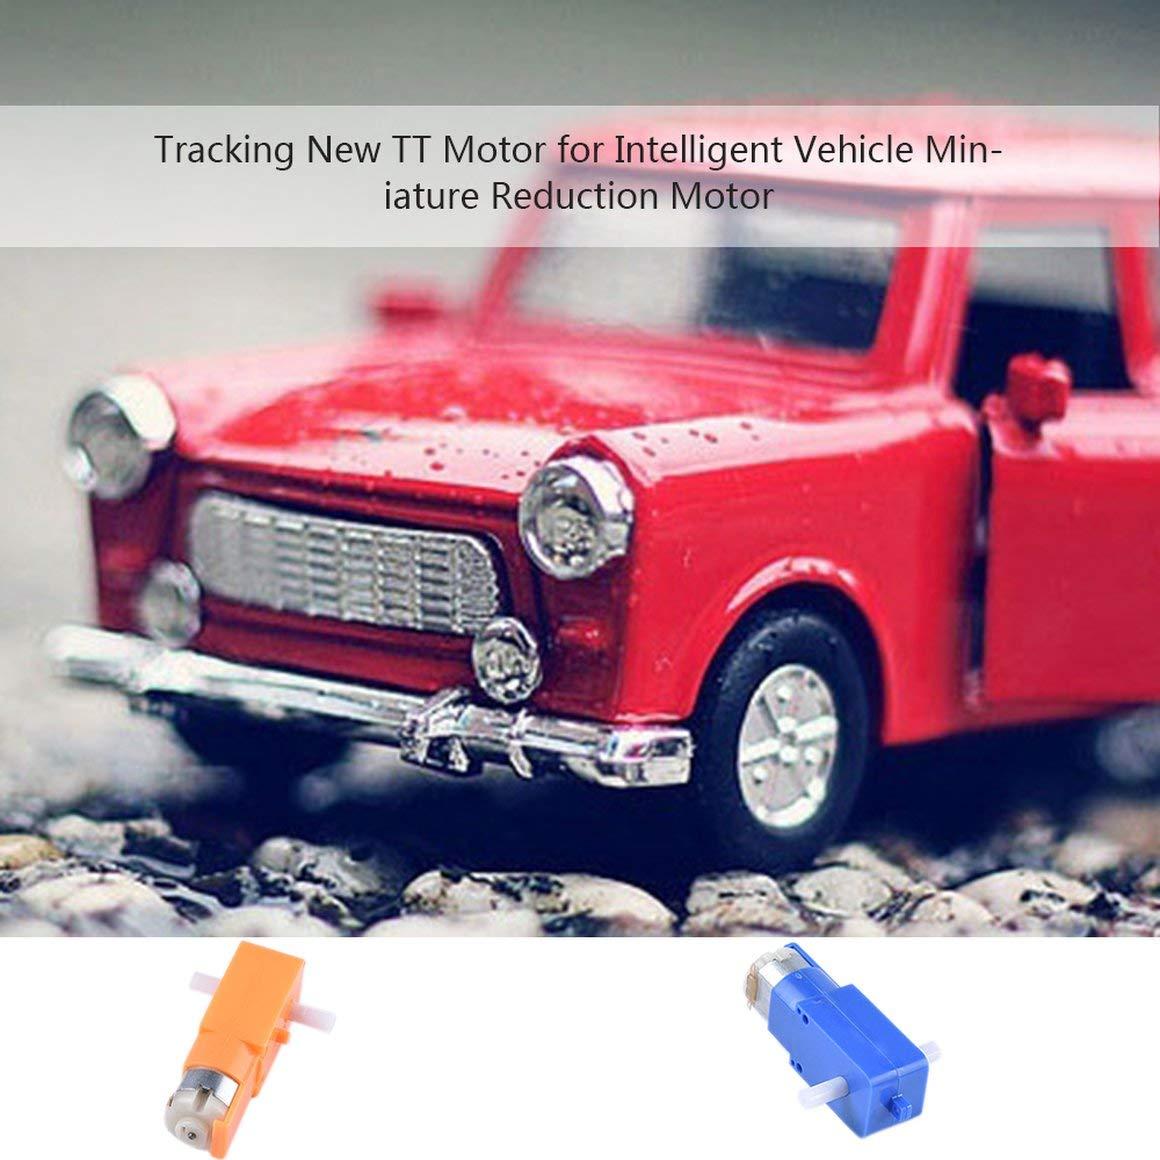 uso para modelos de bricolaje Funnyrunstore TT MOTOR 1 120 Doble eje 3-6V DC Engranaje Motor Im/án fuerte Anti-interferencias